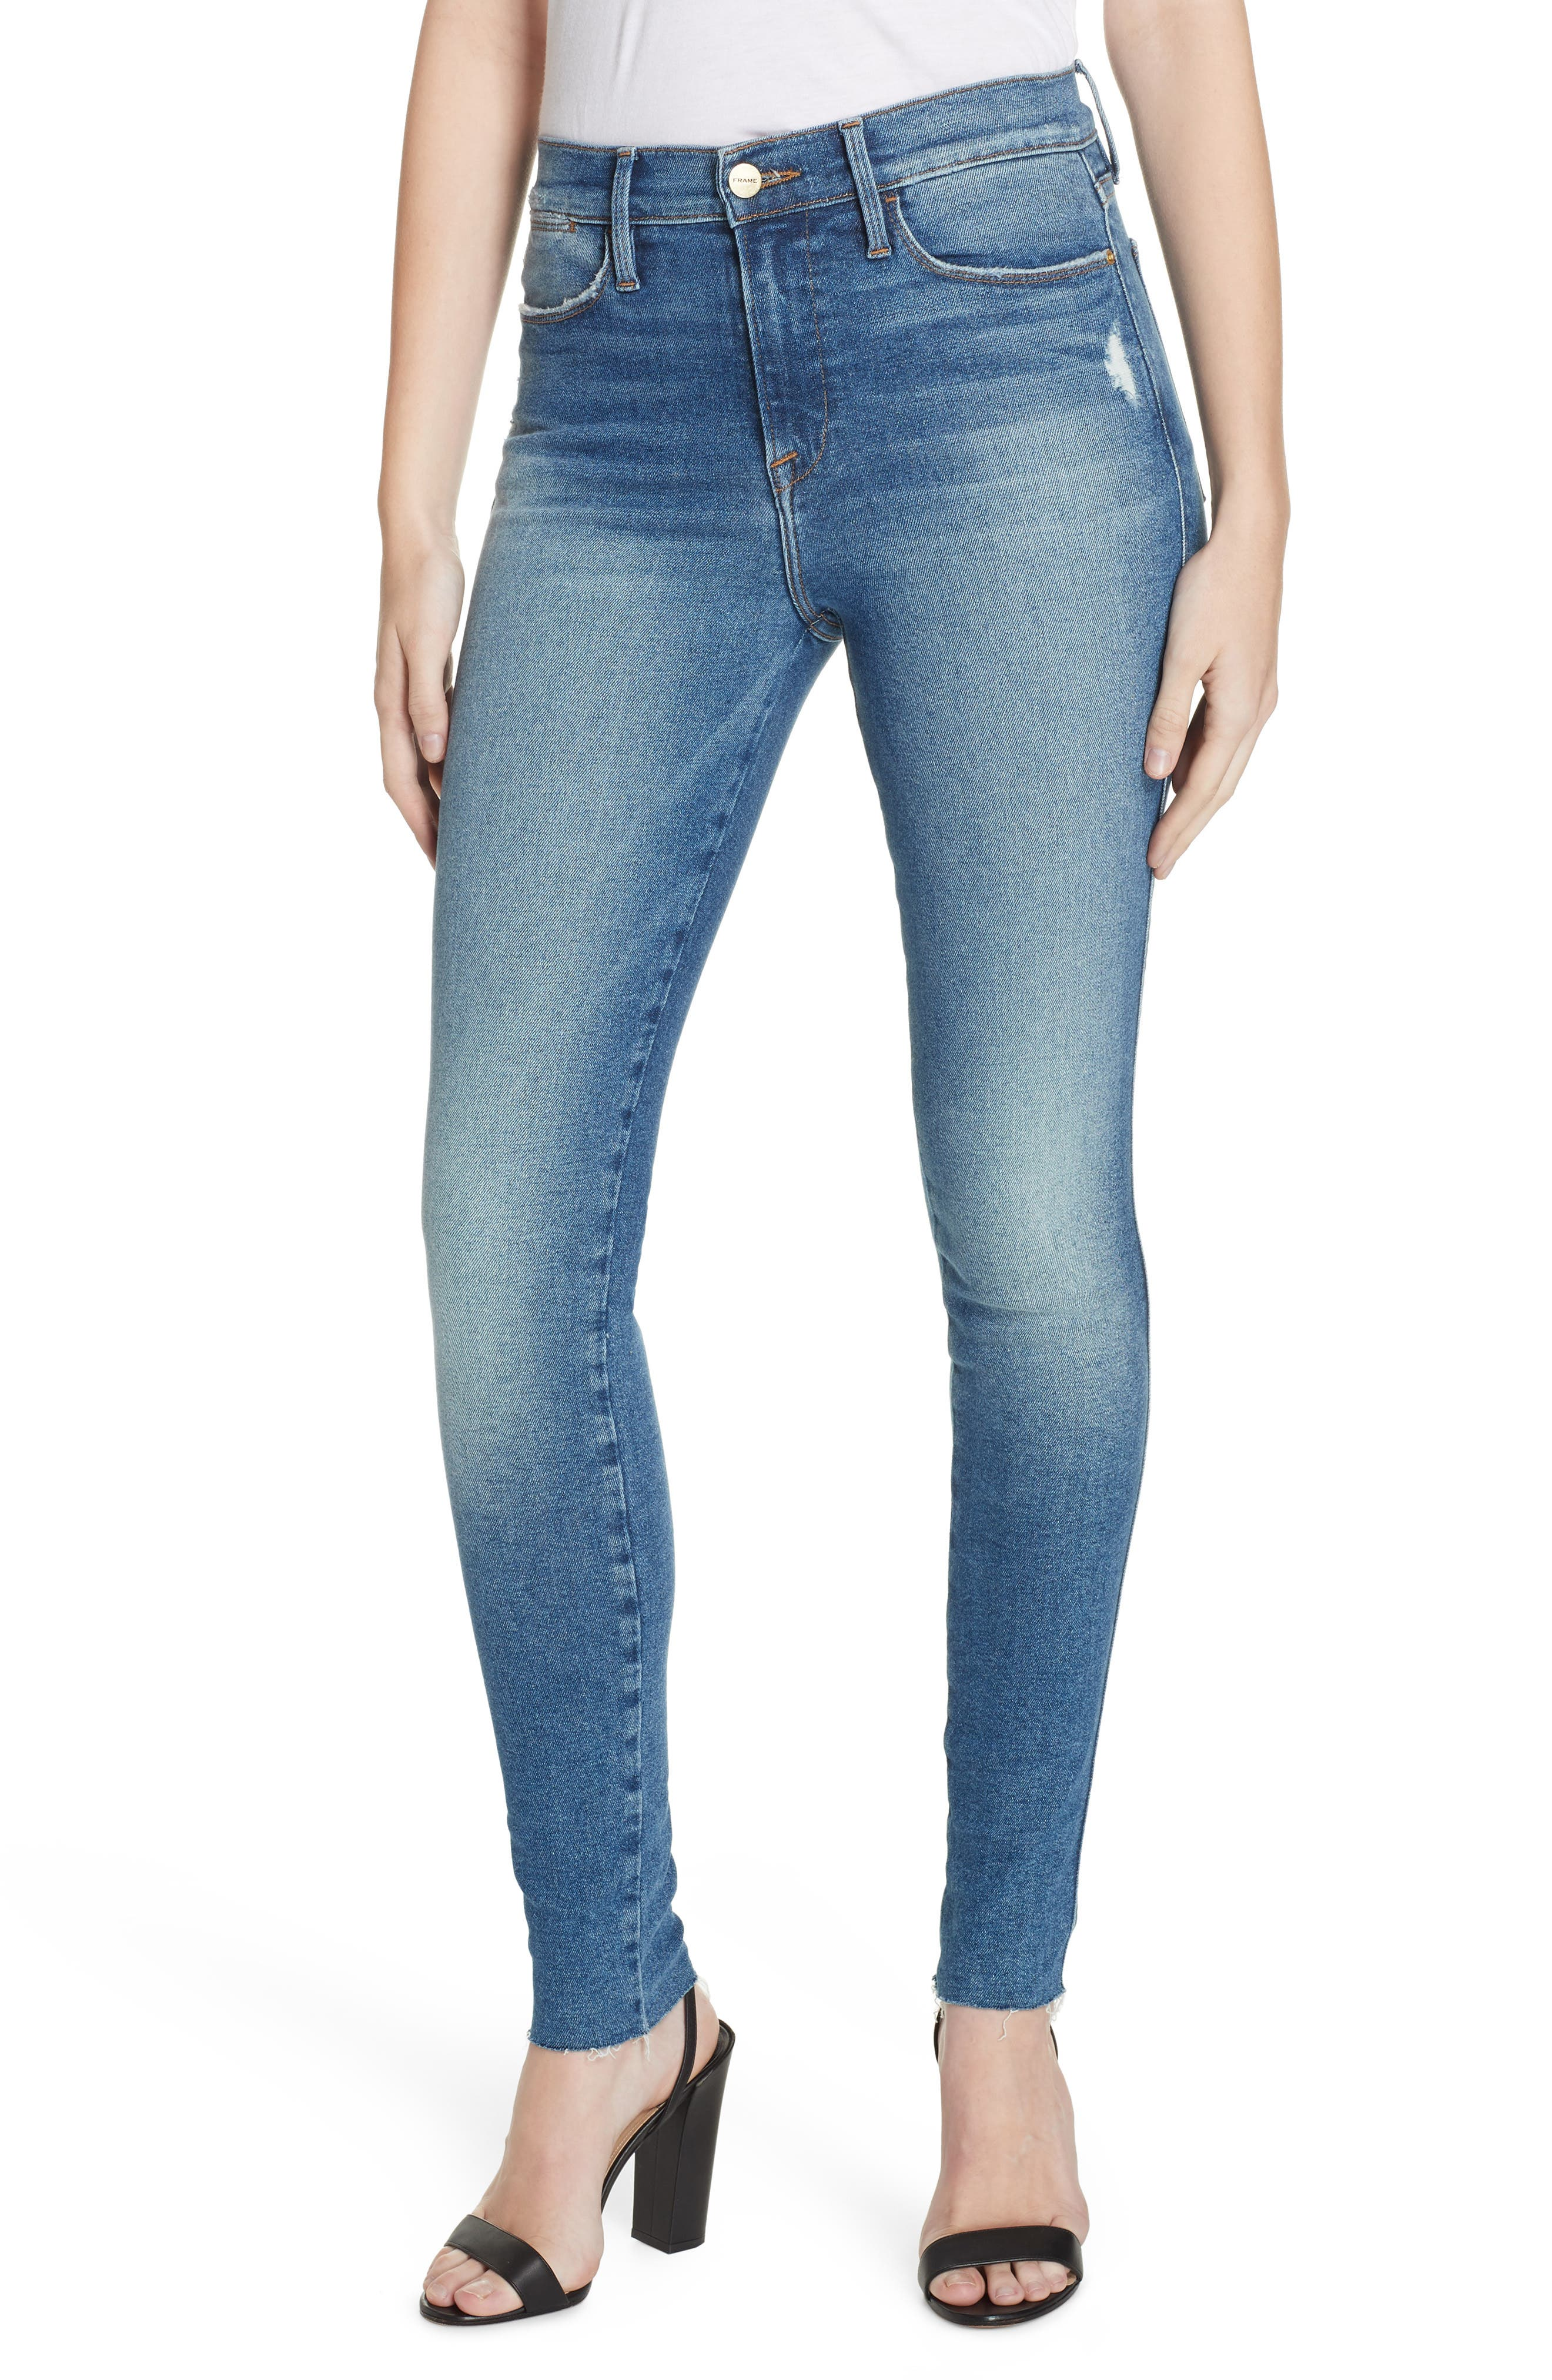 FRAME, Le Skinny de Jeanne High Waist Raw Hem Jeans, Main thumbnail 1, color, MCGRATH